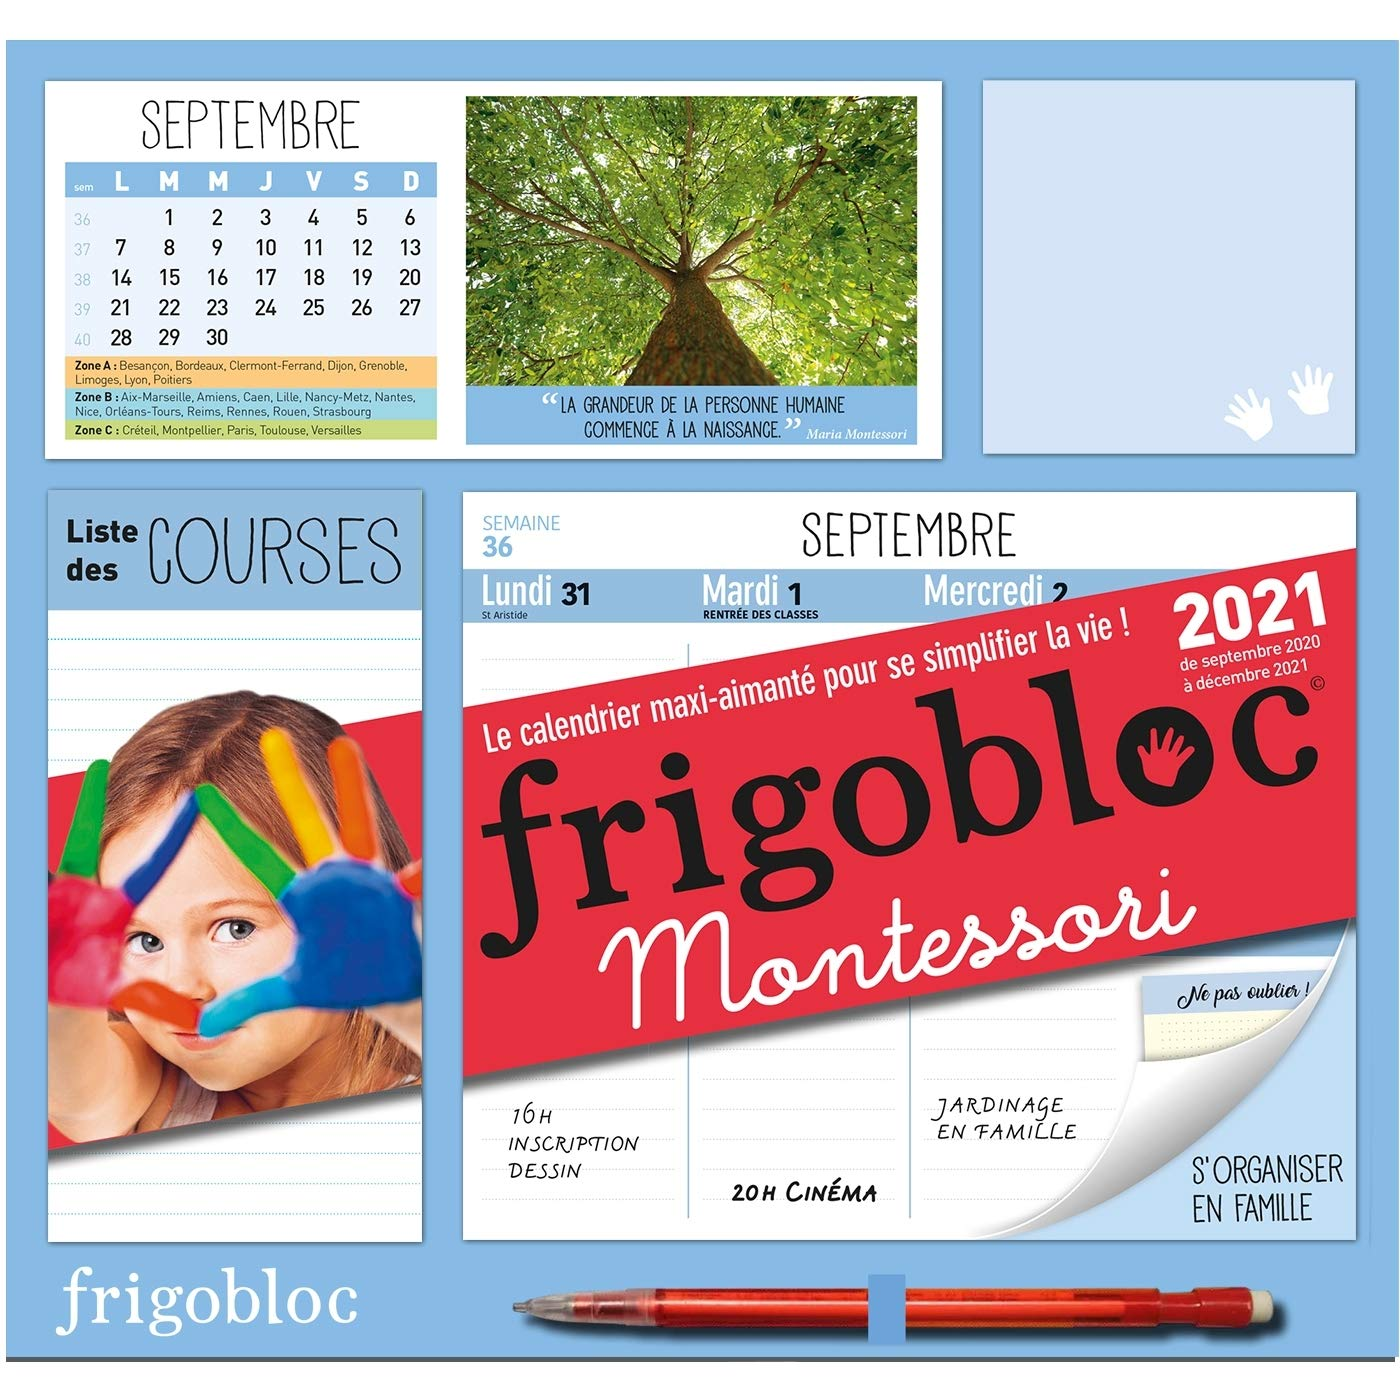 Frigobloc Montessori 2021   Calendrier d'organisation familiale